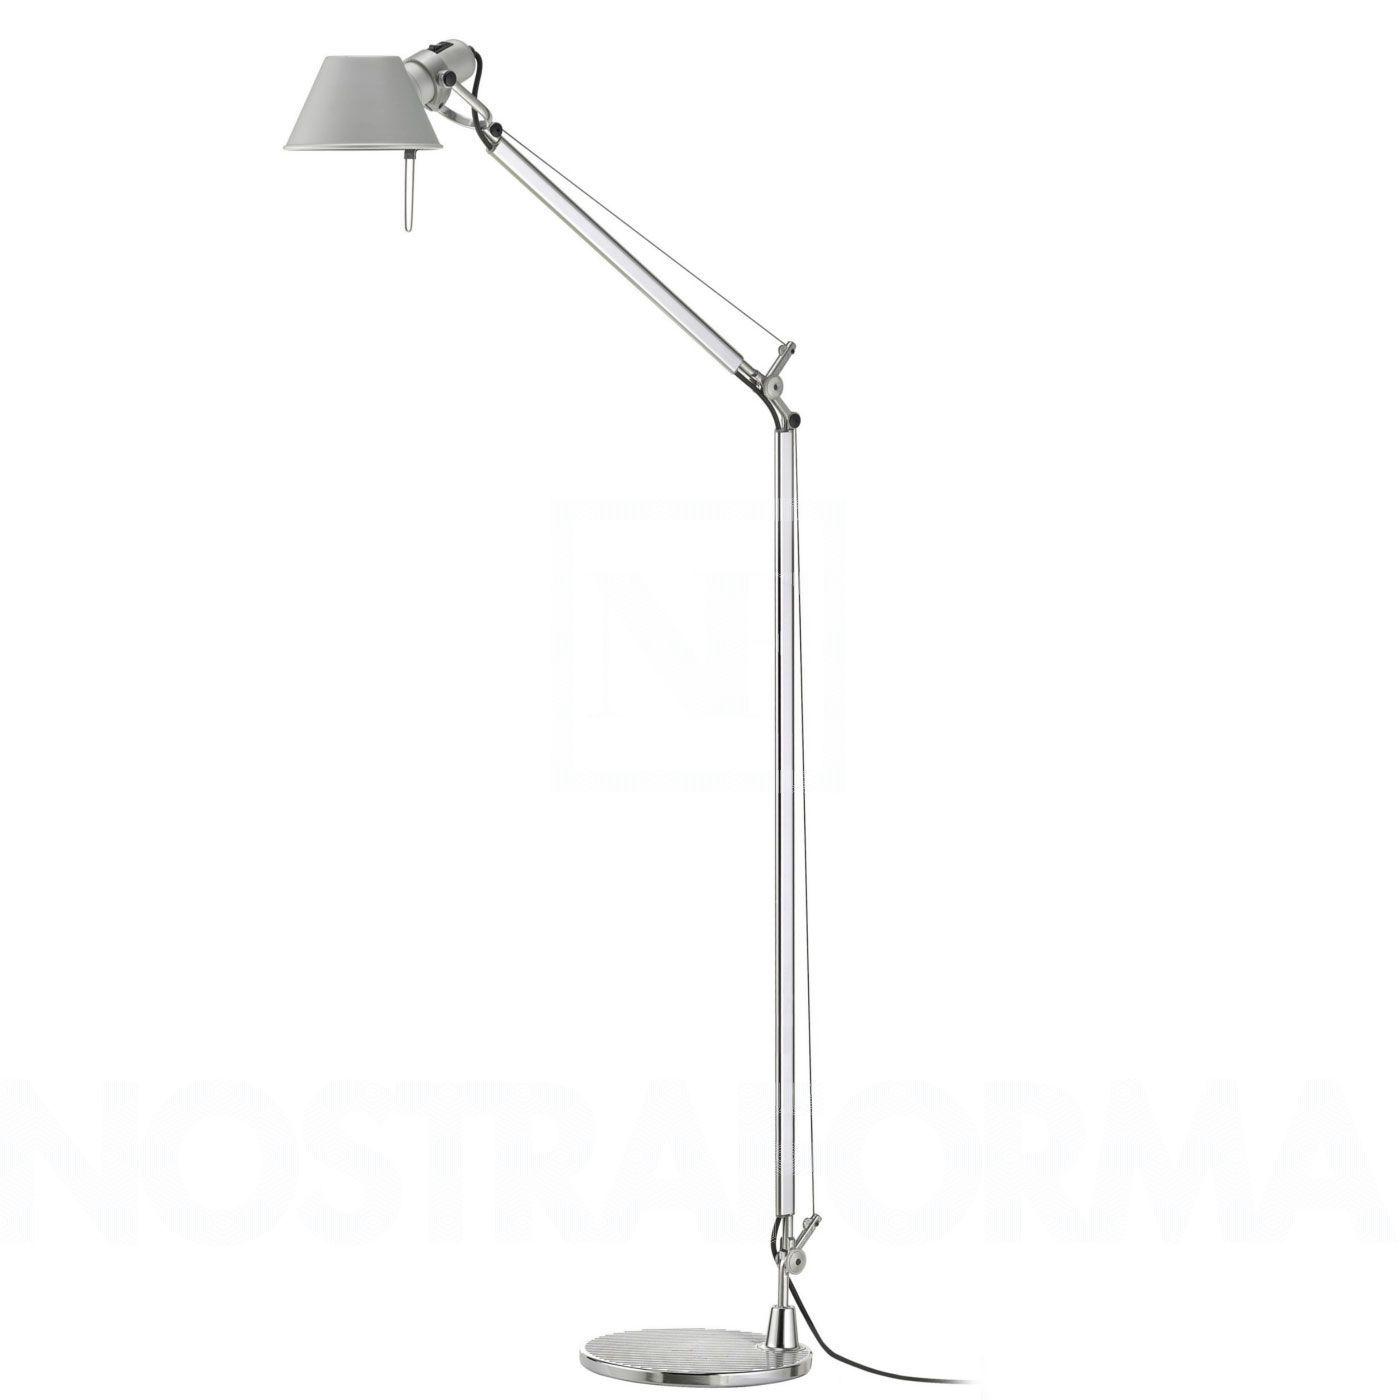 Artemide Tolomeo Lettura Halo Floor Lamp Moderne Stehlampen Bodenlampe Beleuchtungsideen